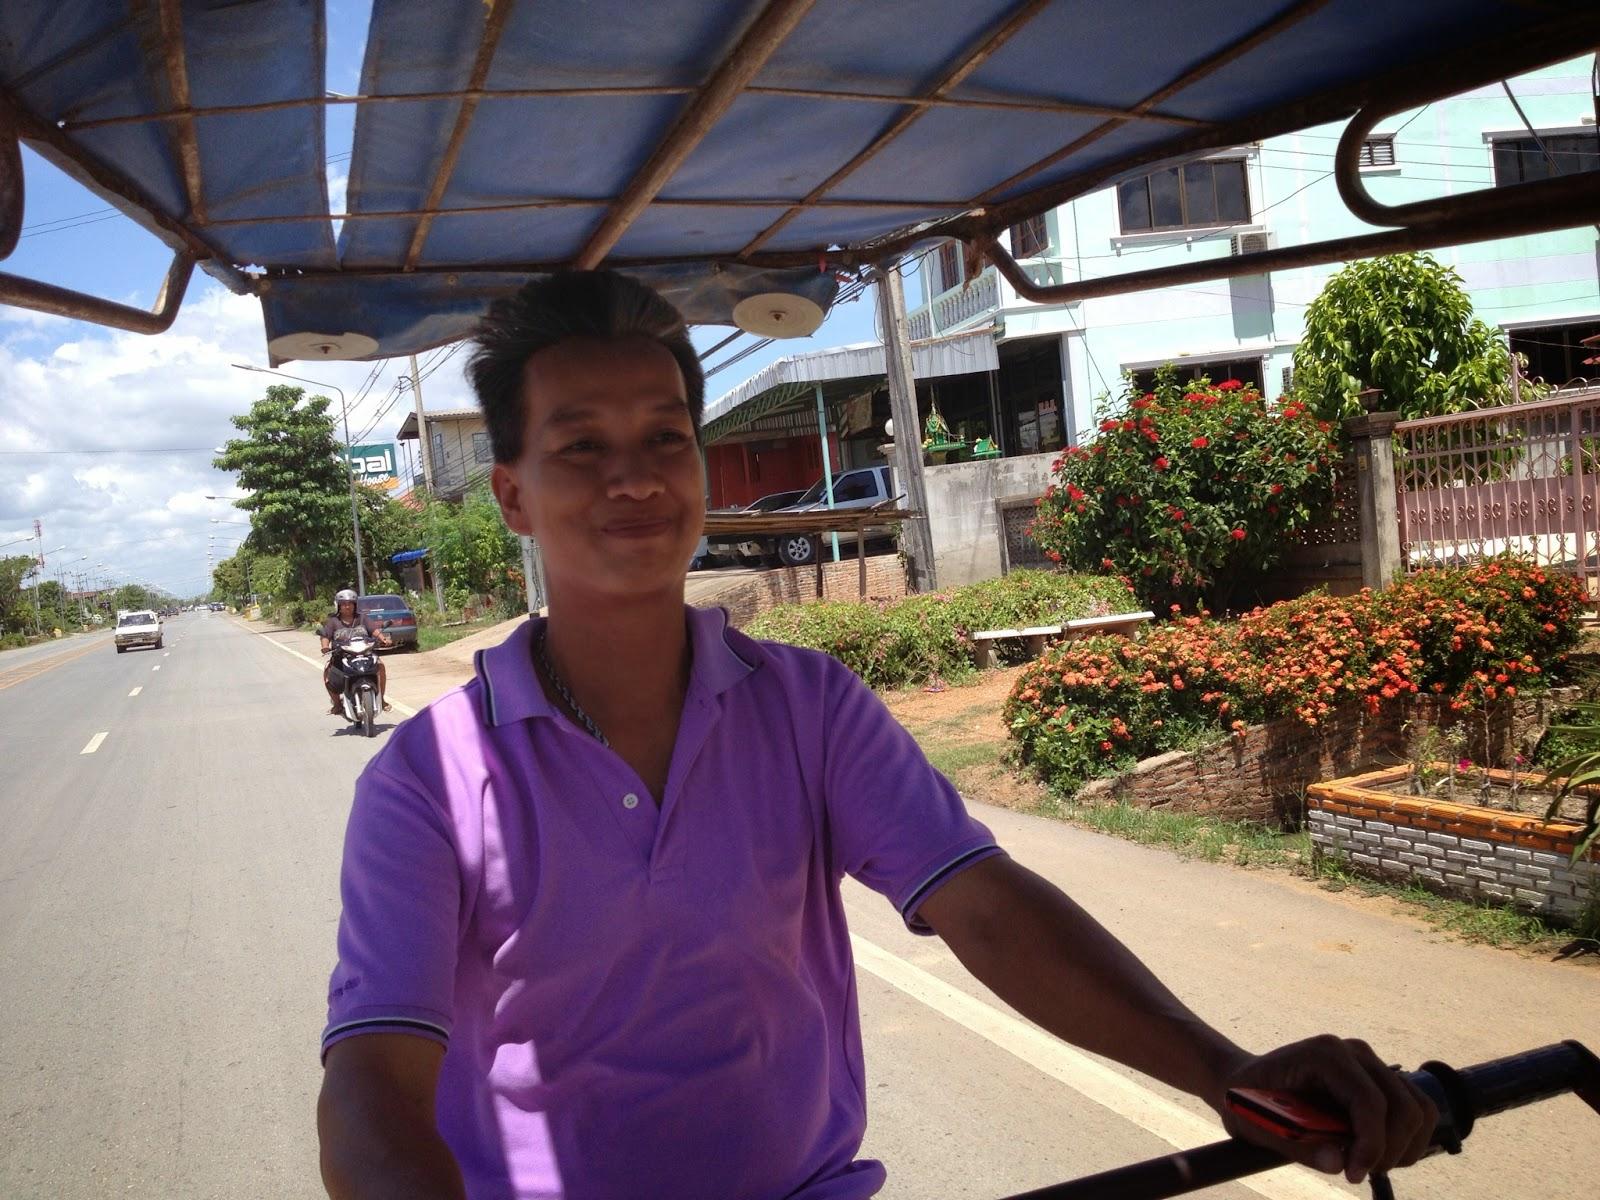 Old Sukhothai - Prajin behind the wheel